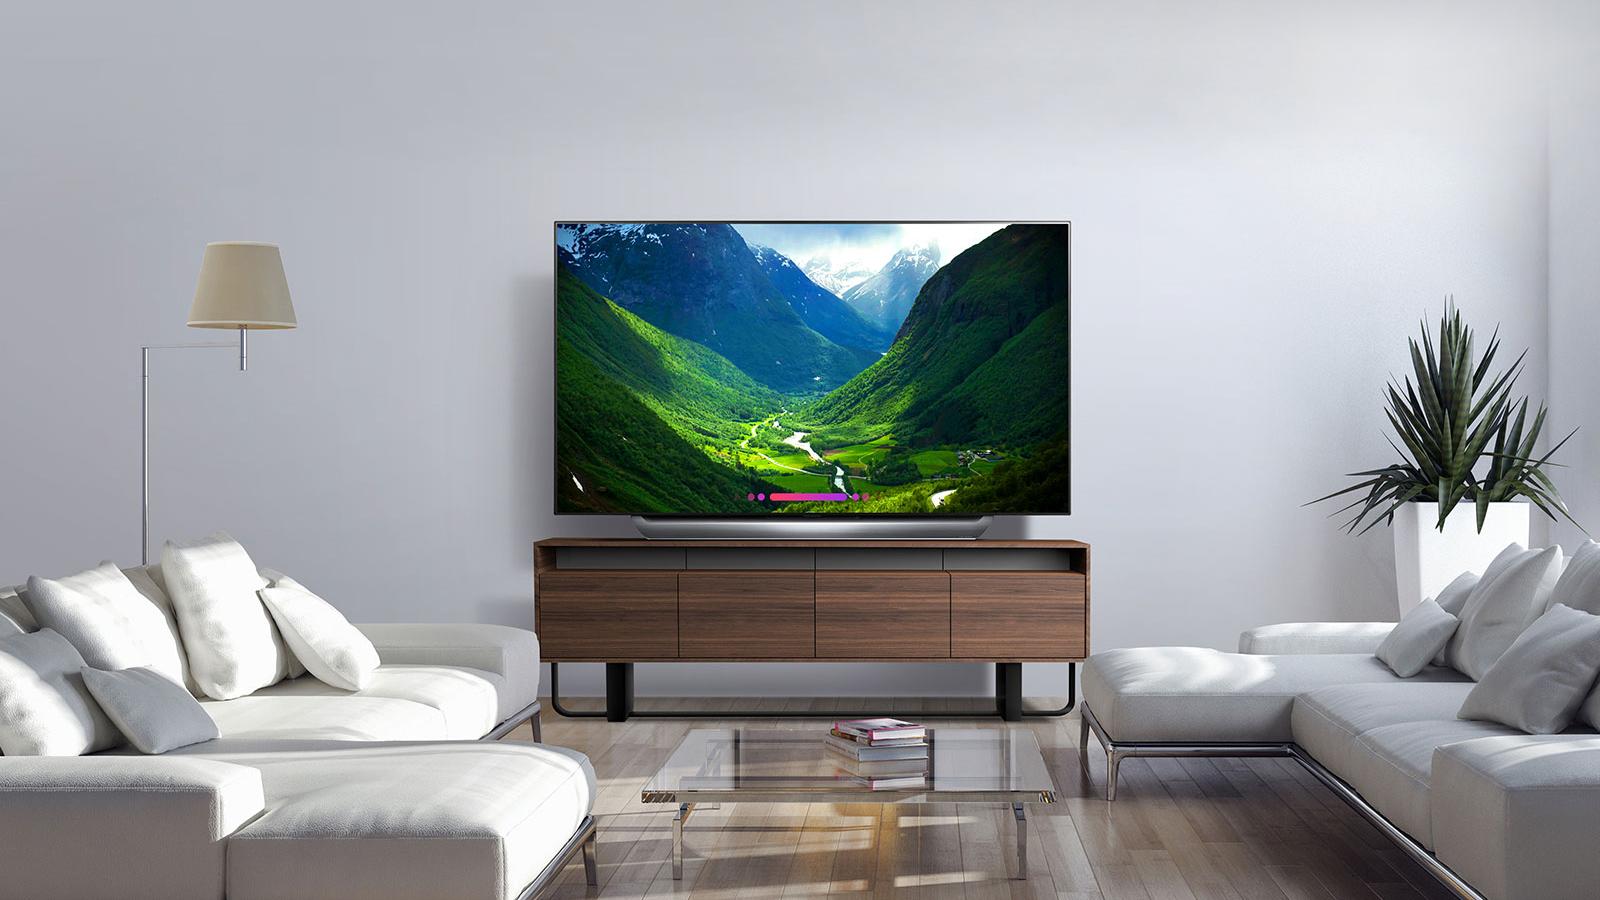 LG C8 OLED (OLED55C8, OLED65C8) review | TechRadar